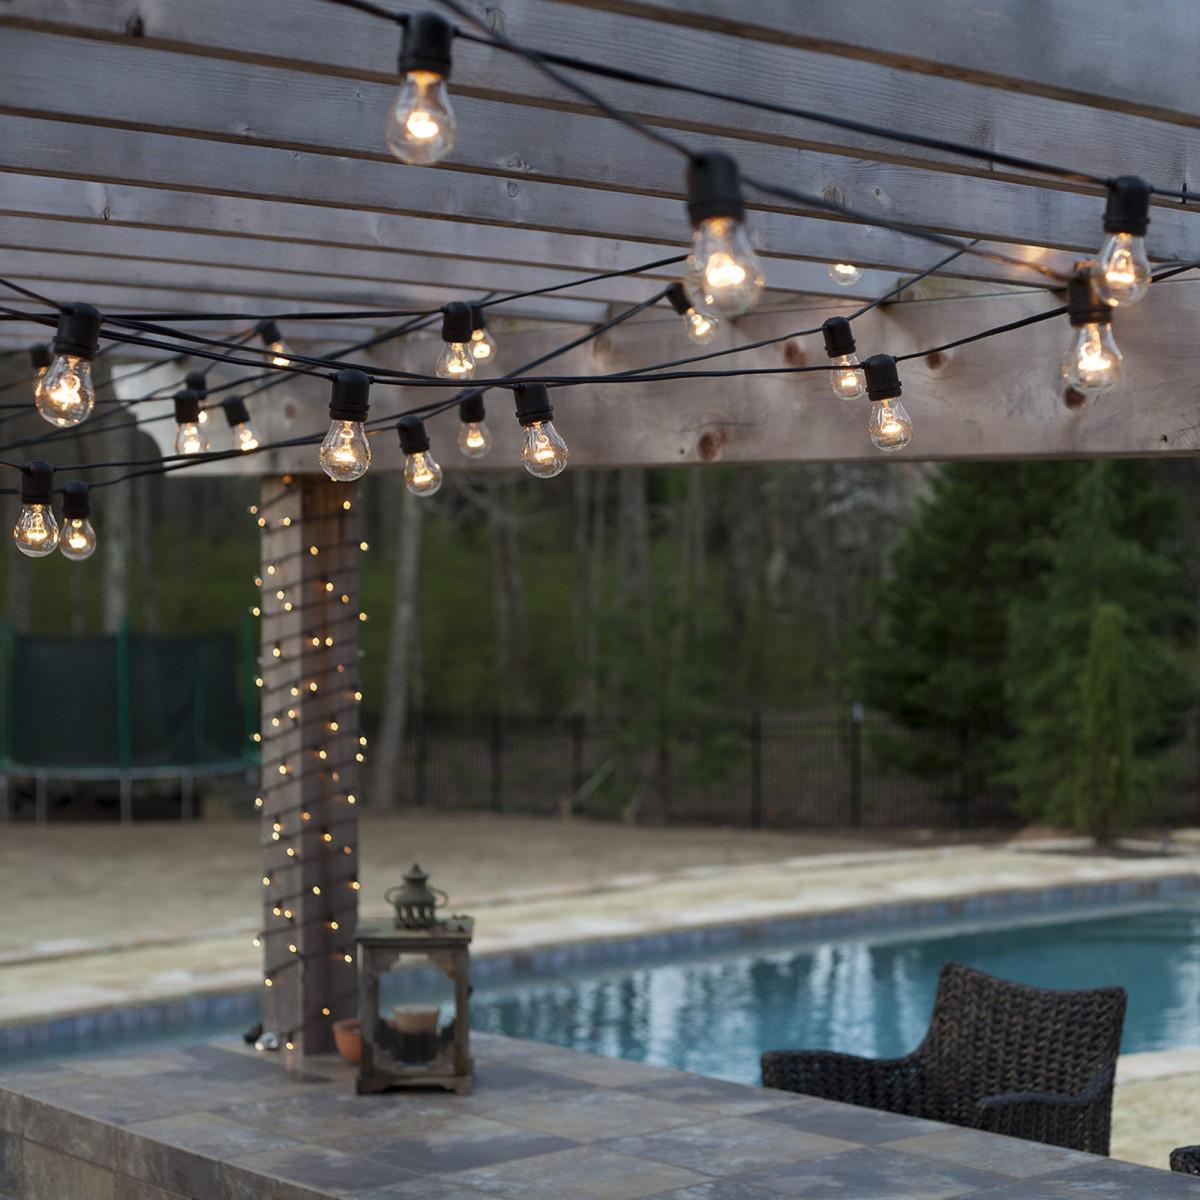 Feestverlichting LED Patio 10 helder - 10 meter / 12 fittingen